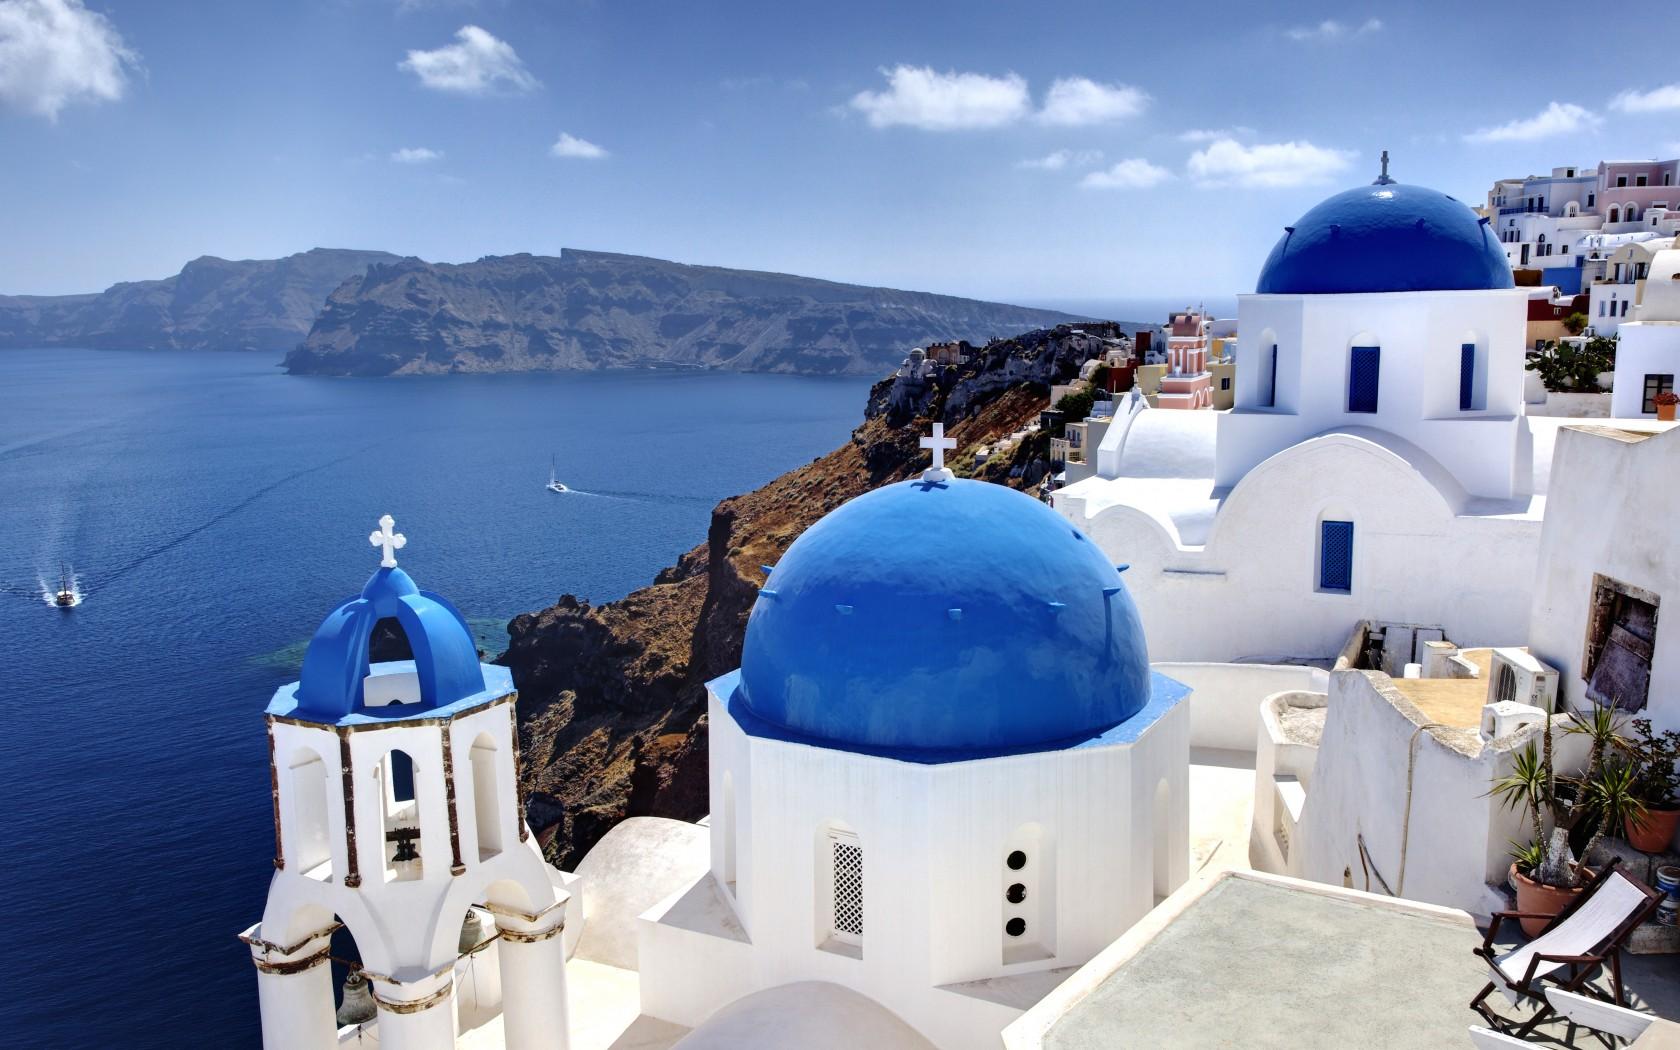 11_Greek_Island_103879532-1680x1050